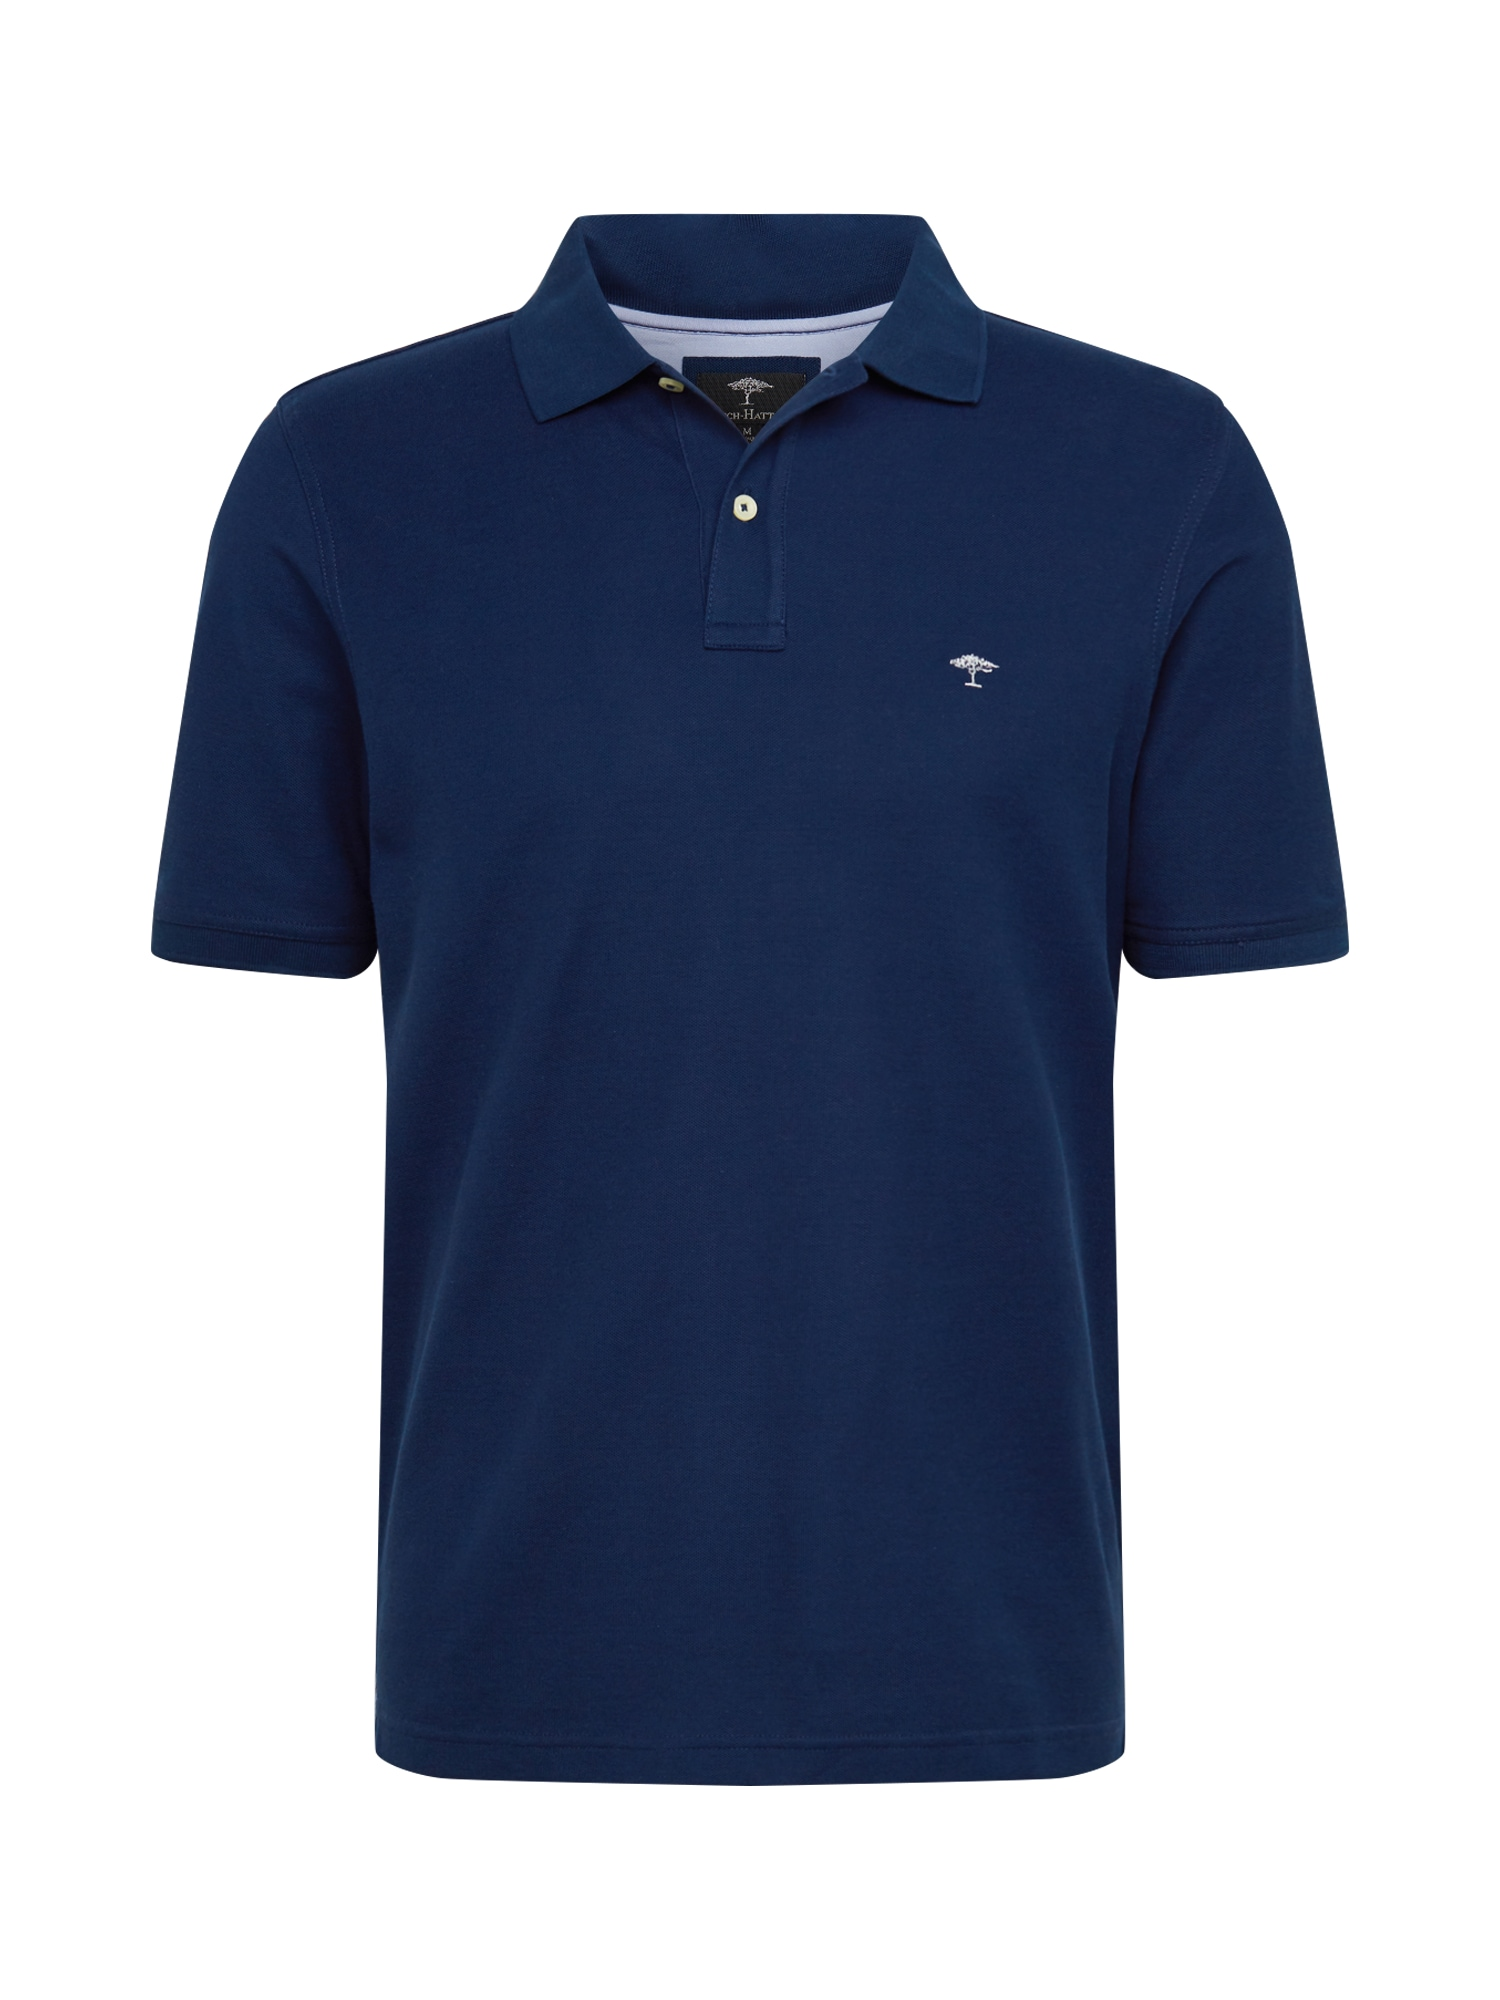 FYNCH-HATTON Marškinėliai 'SNOS 1700' nakties mėlyna